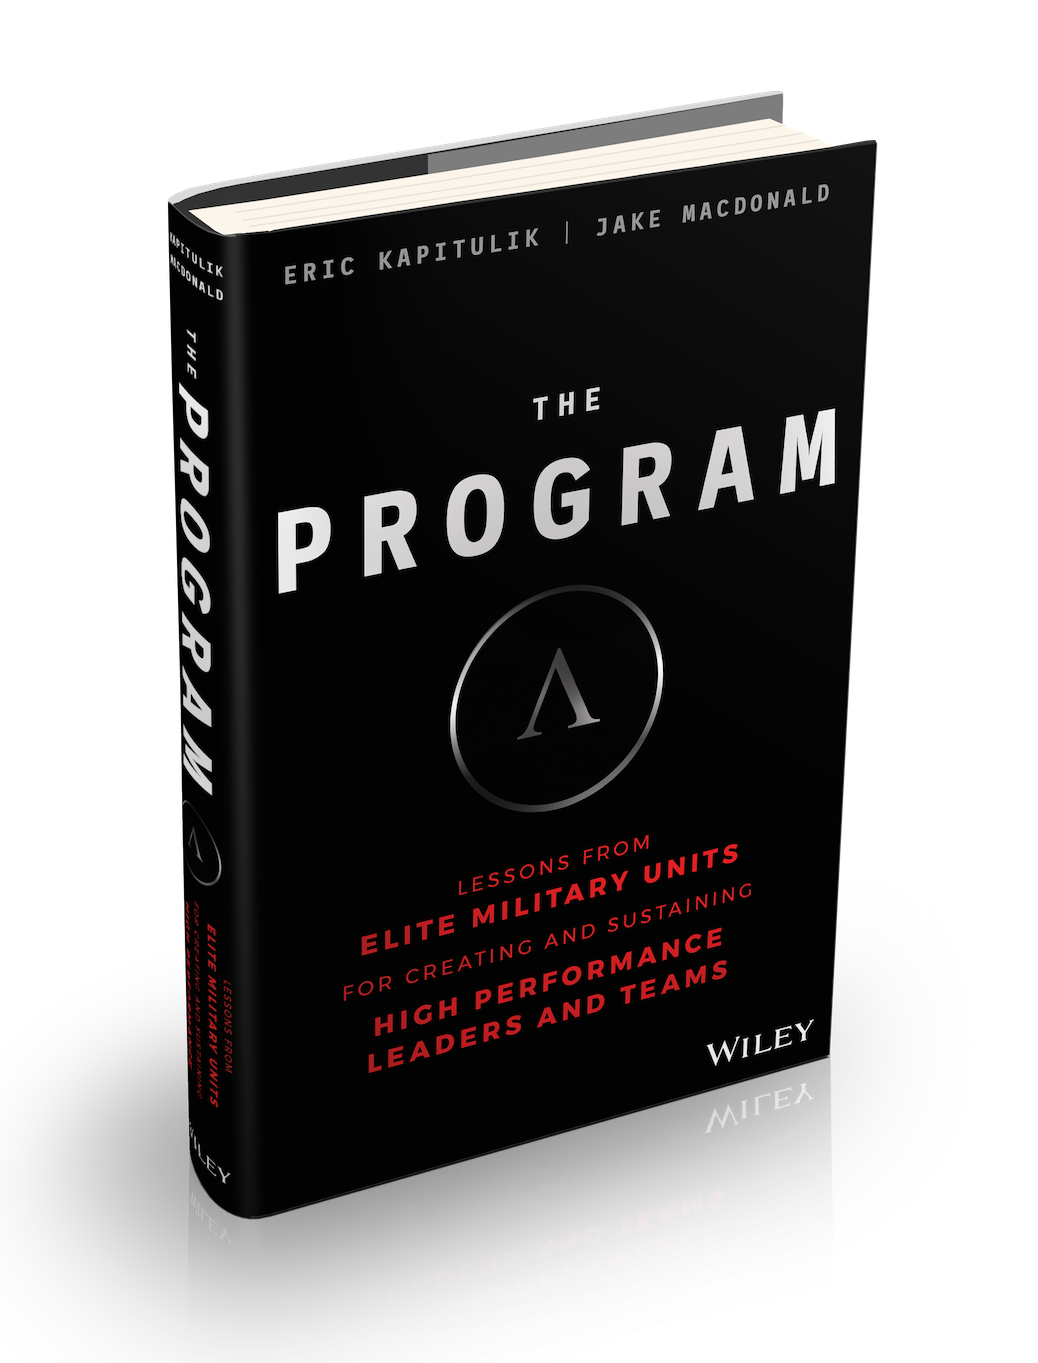 The Program by Kapitulik and MacDonald.png